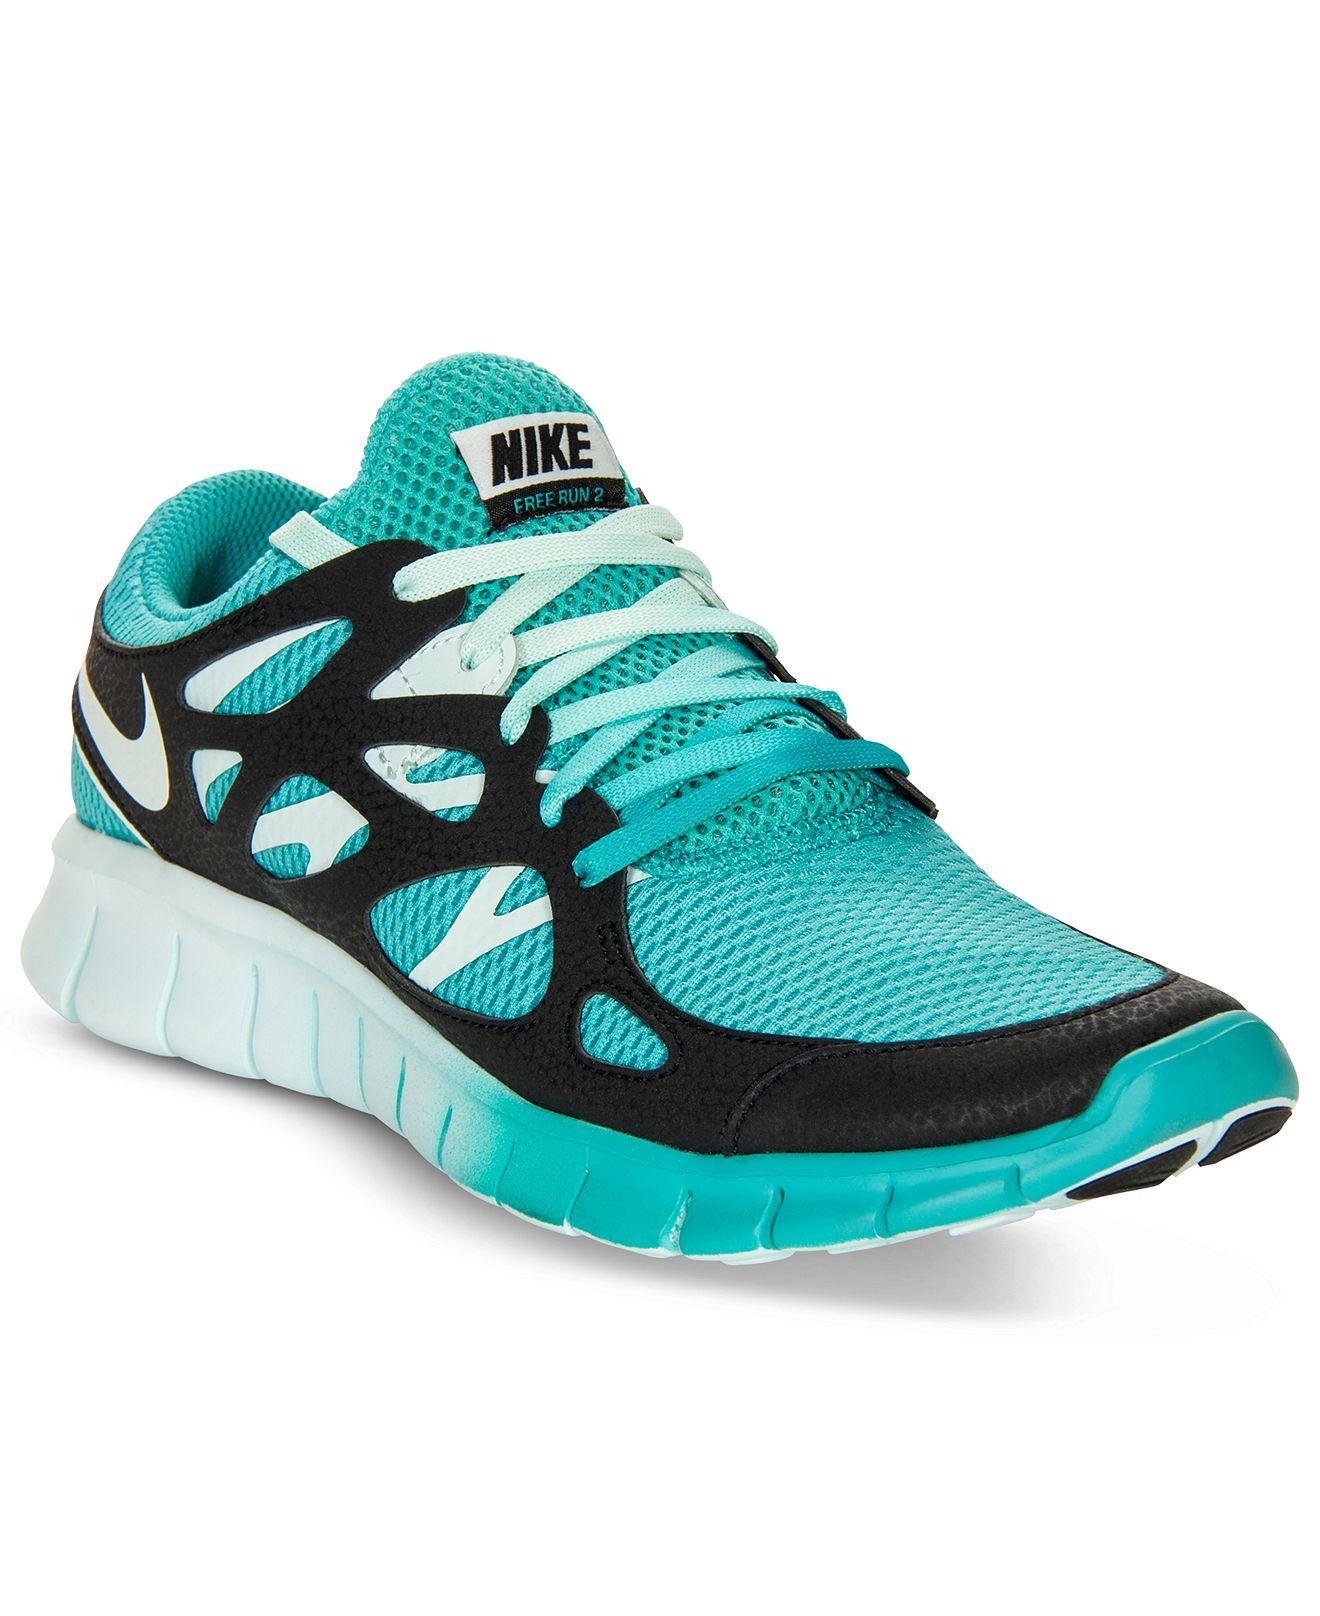 9e9c03887d8f0 ... discount find sneaker 73f8f b71ba nike womens shoes free run 2 ext  running sneakers sneakers 7b955